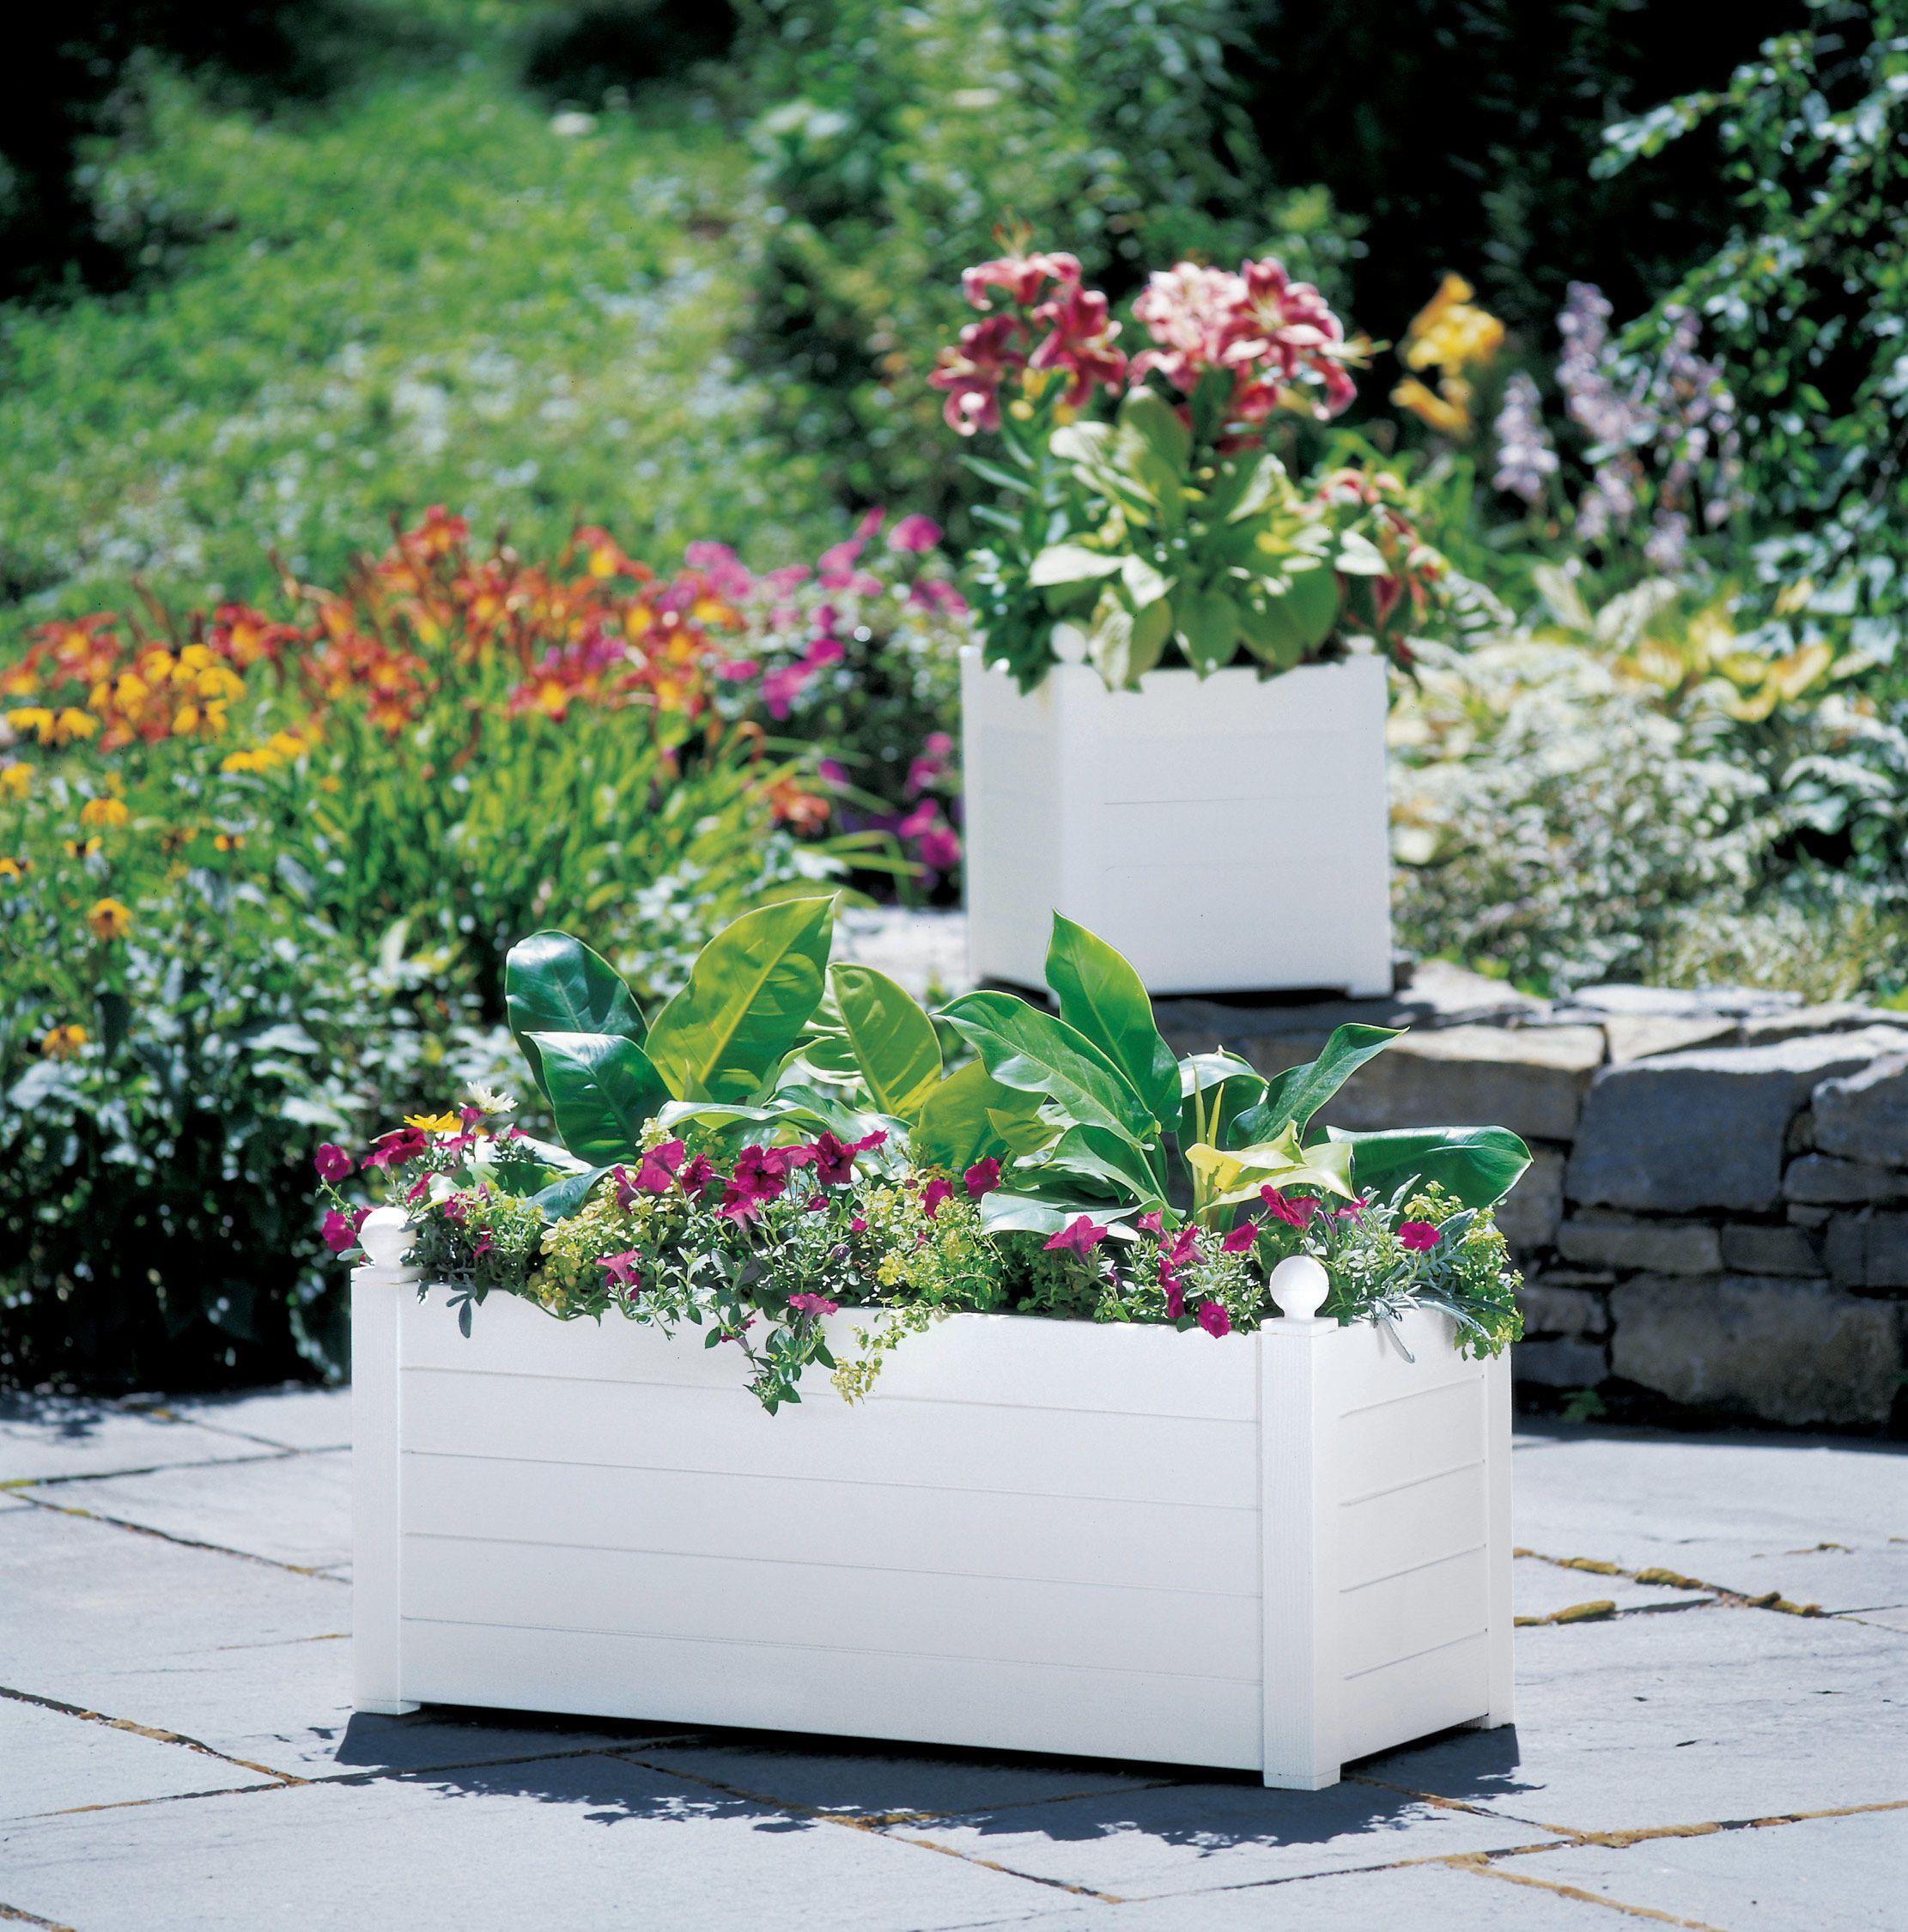 057c552d5bce06c3cc07346408f4de06 - Gardeners Supply Self Watering Window Box